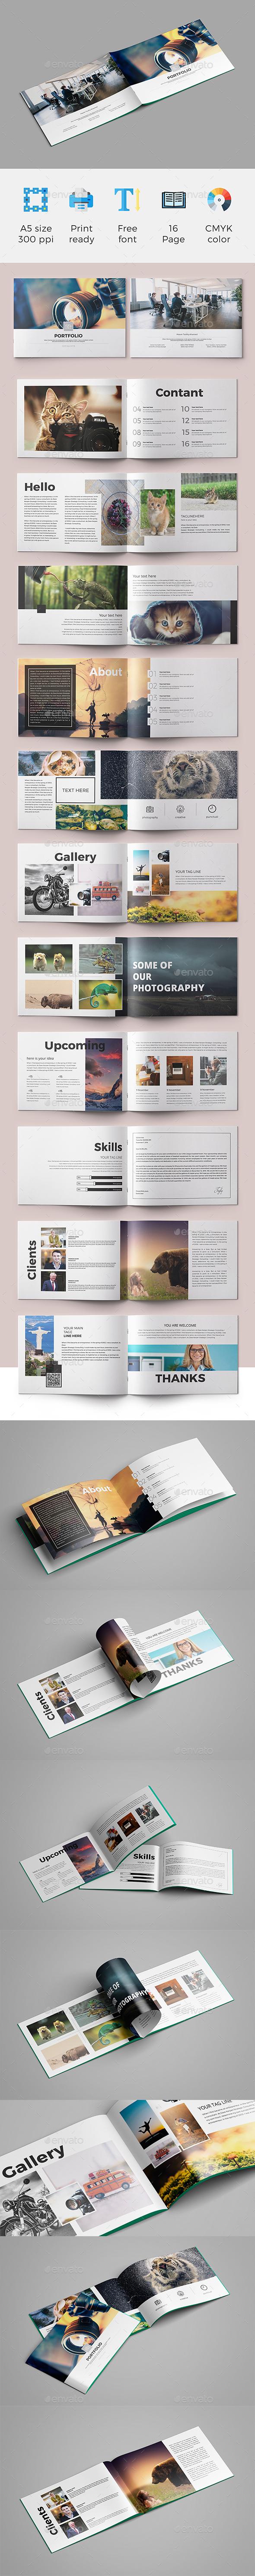 A5 Brochure (Portfolio) 03 - Portfolio Brochures